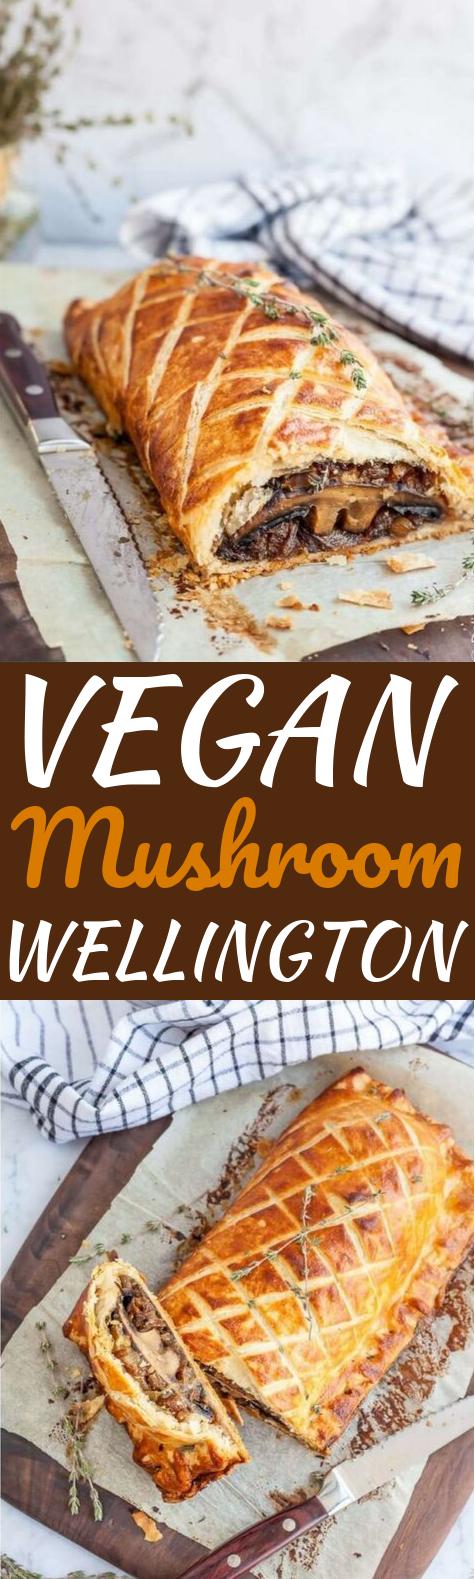 Vegan Mushroom Wellington #vegan #dinner